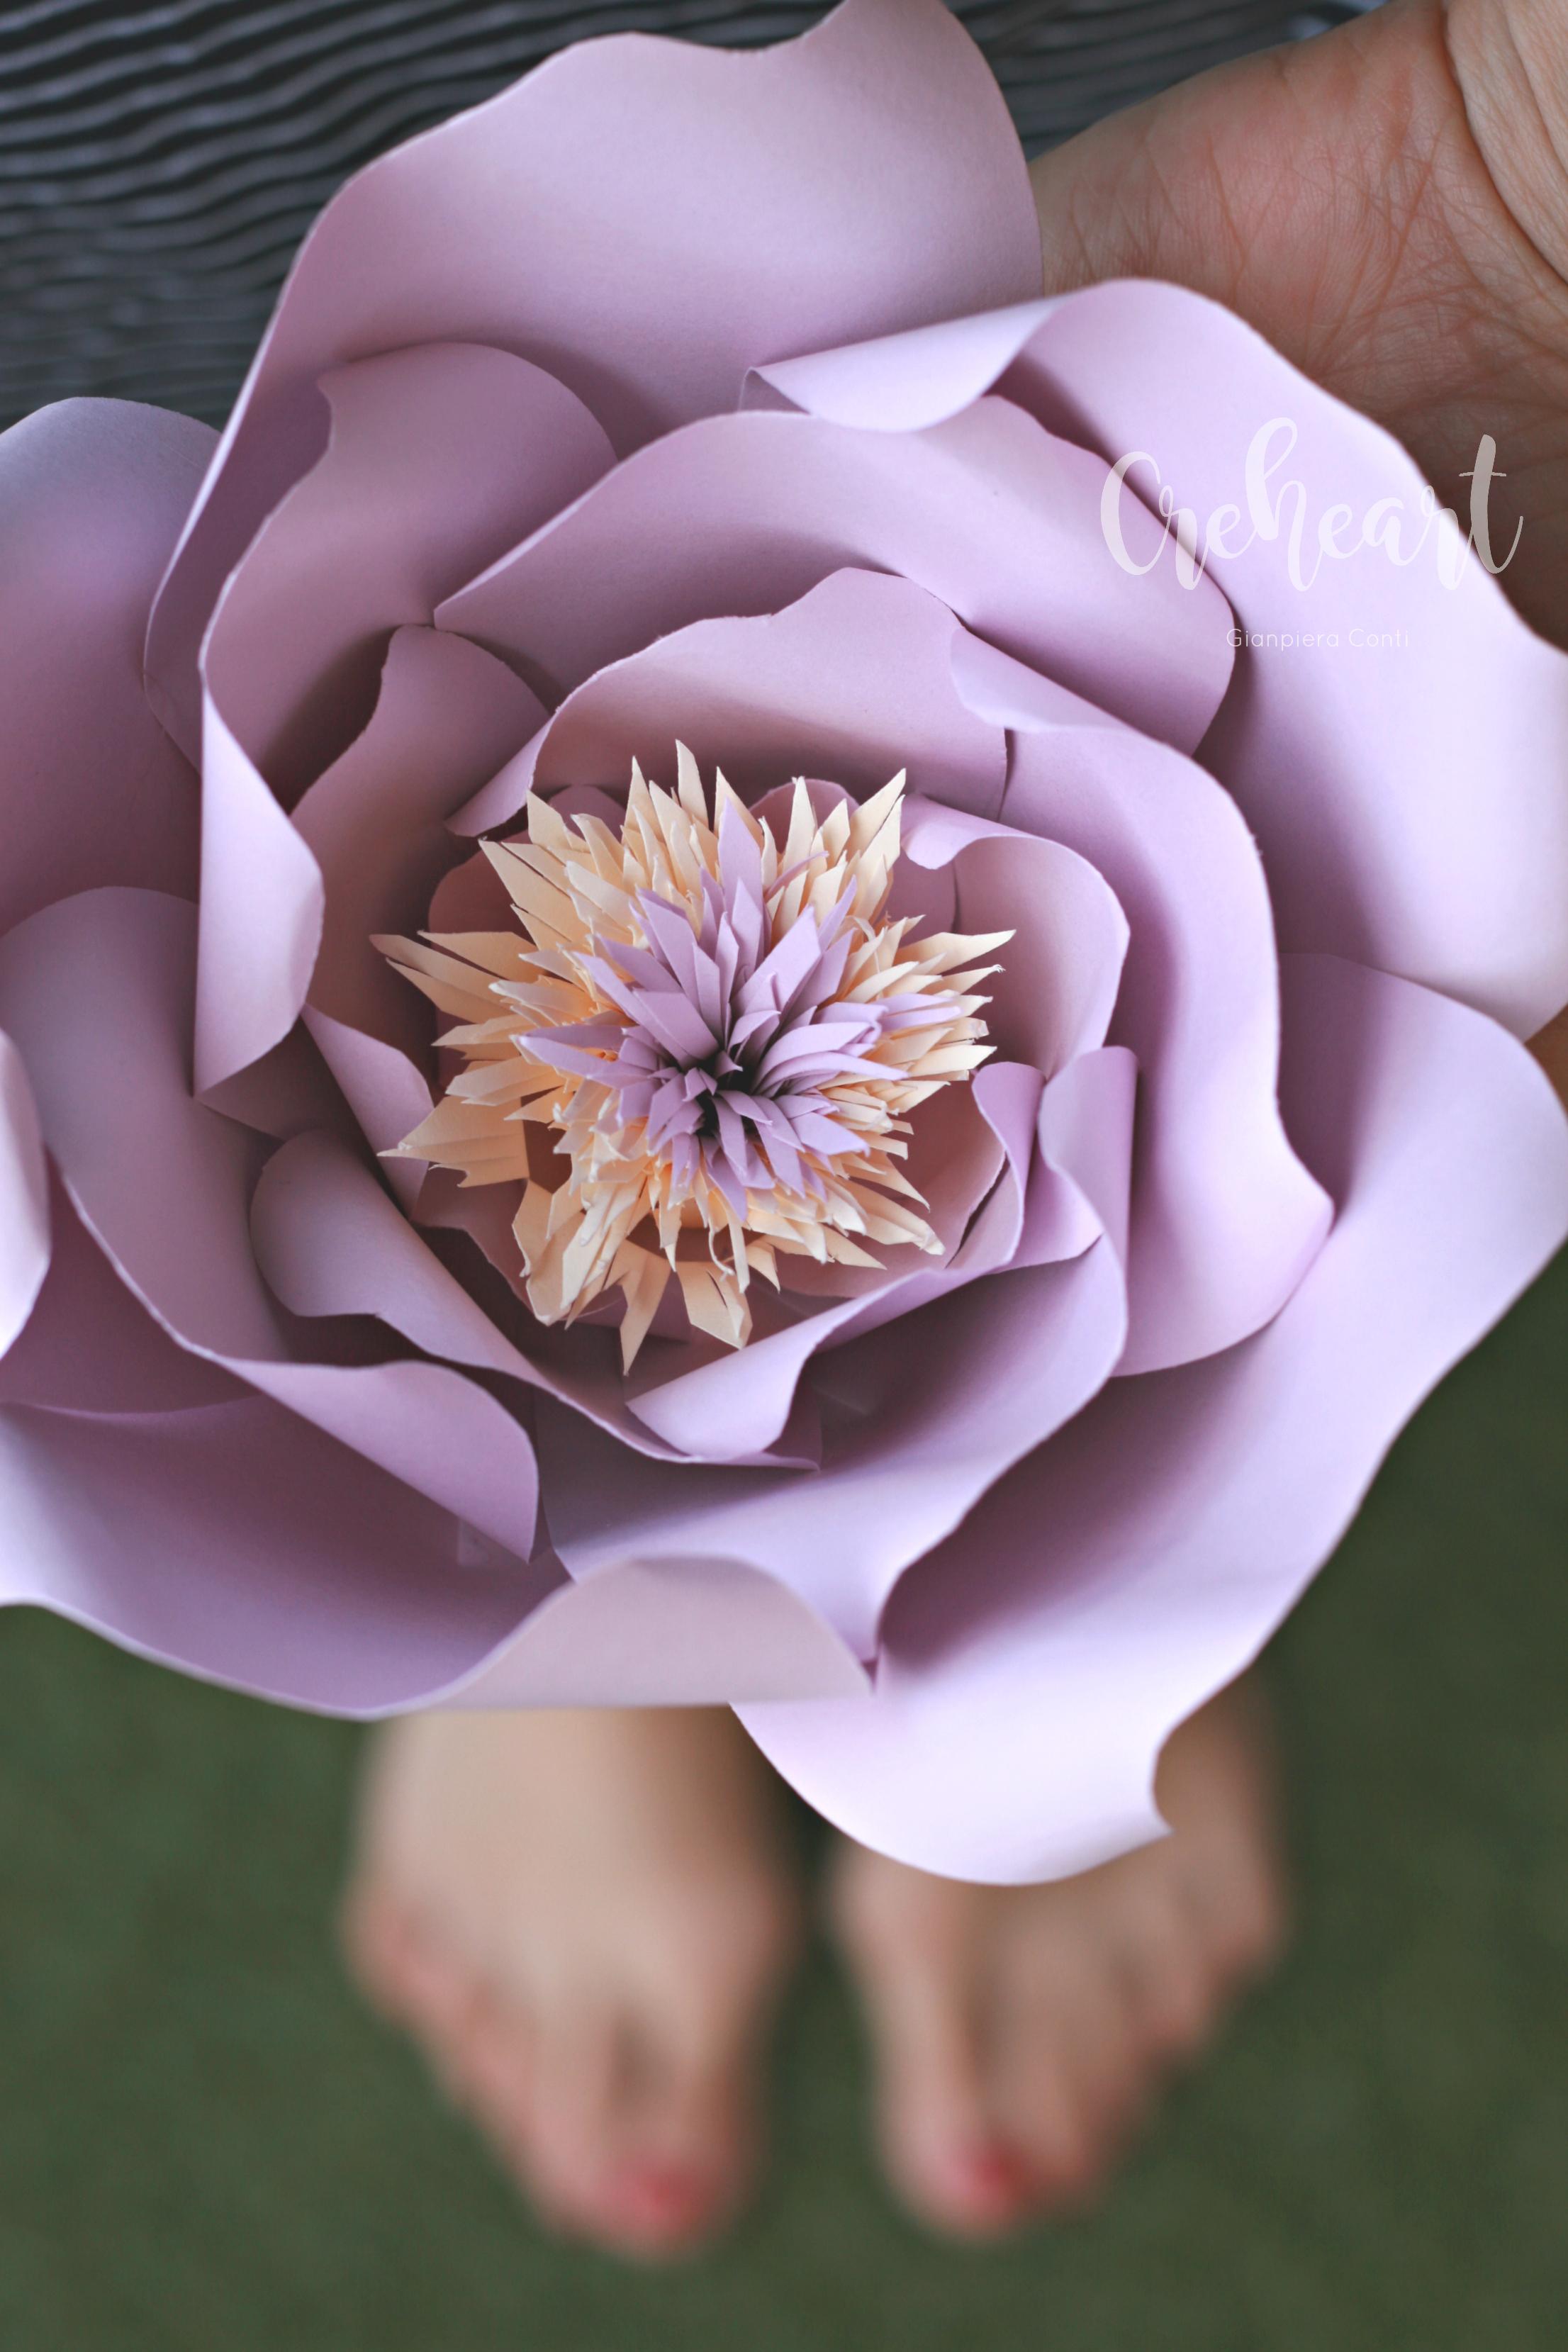 Flower artichocke b.jpg